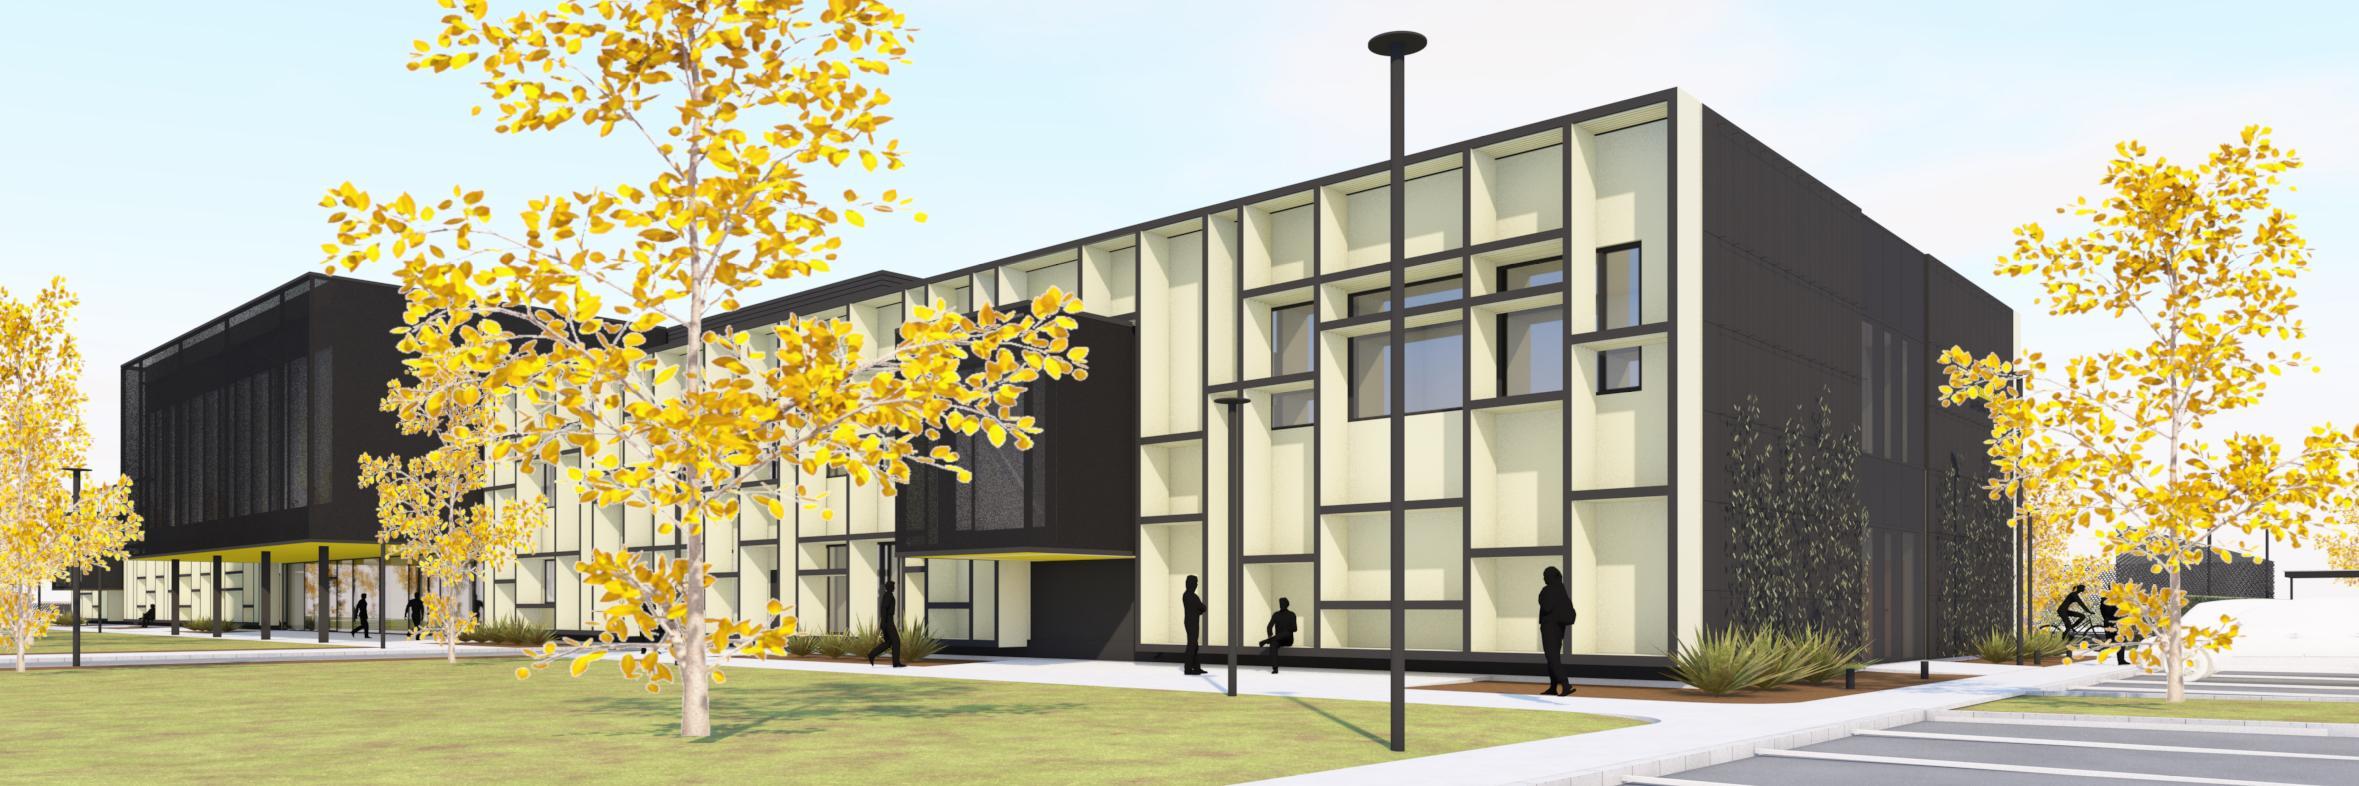 Saaremaa Gümnaasiumi ehitusleping sõlmiti Nordeconiga